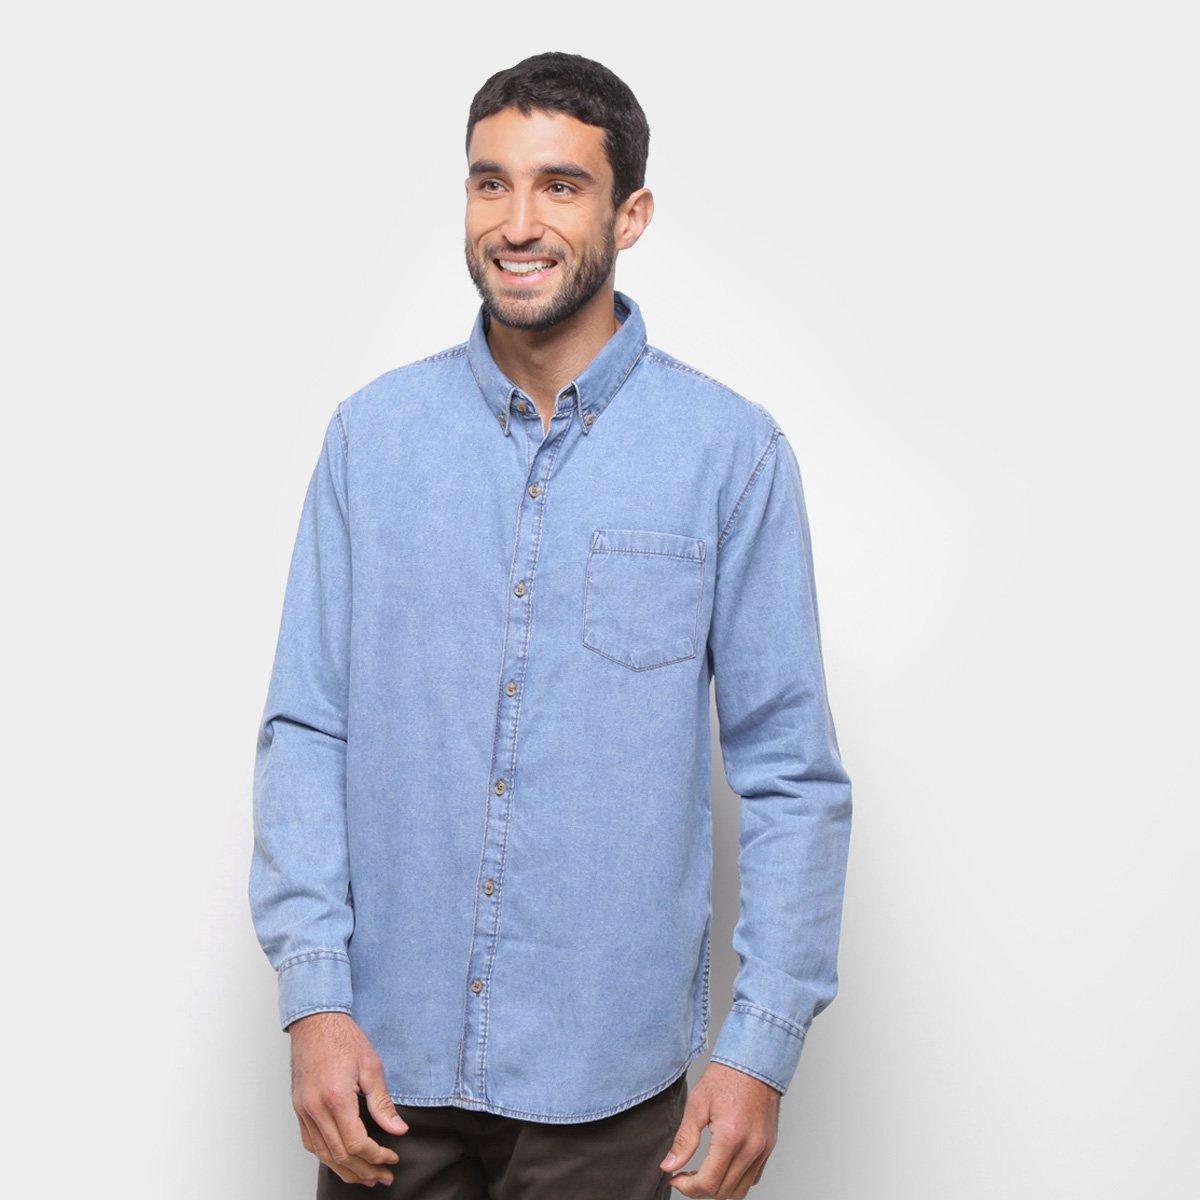 Camisa Jeans Manga Longa Hering Bolso Masculina